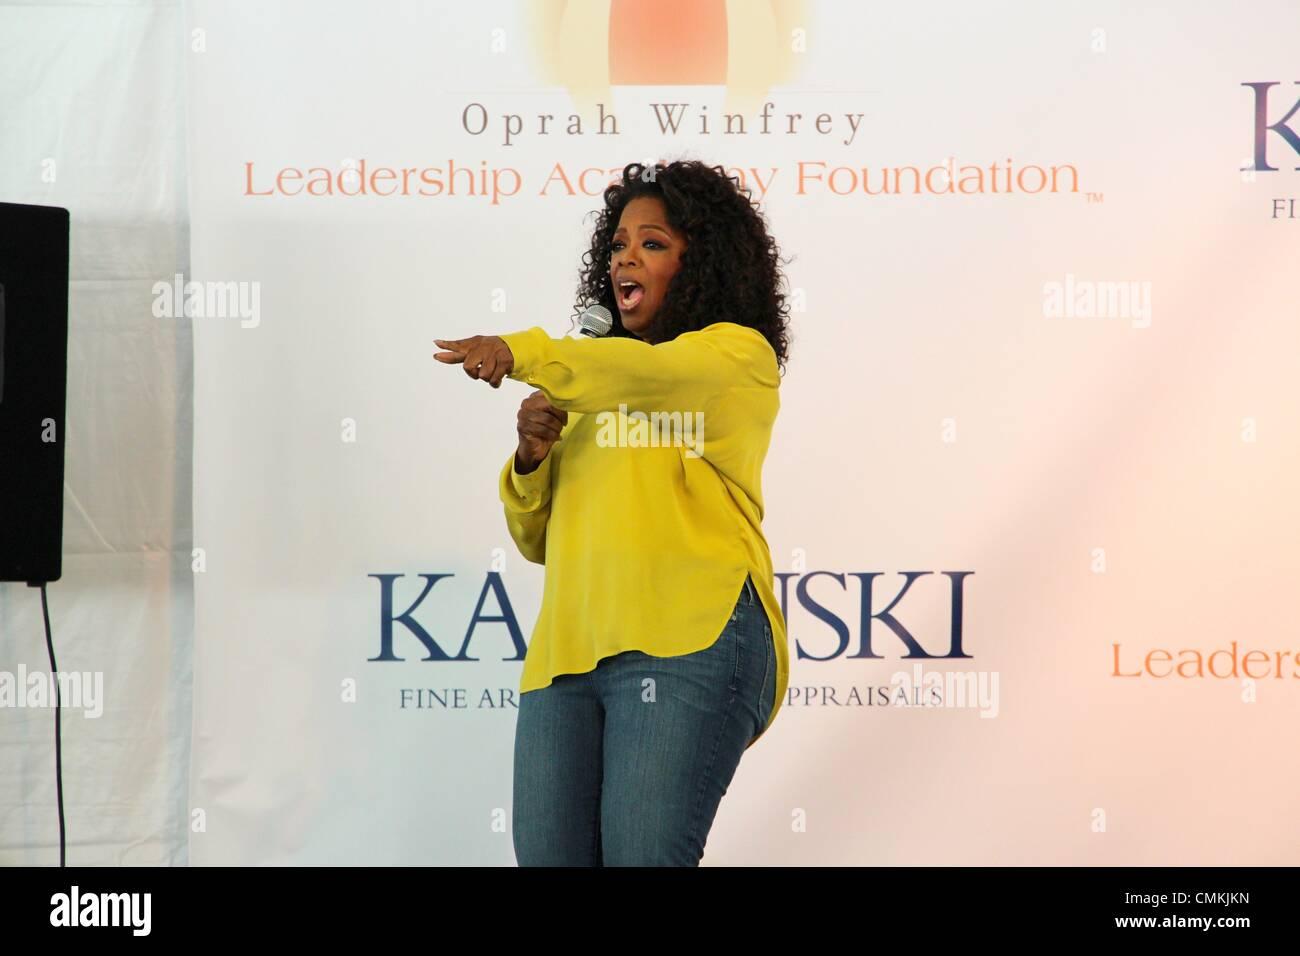 oprah-winfrey-auction-CMKJKN.jpg